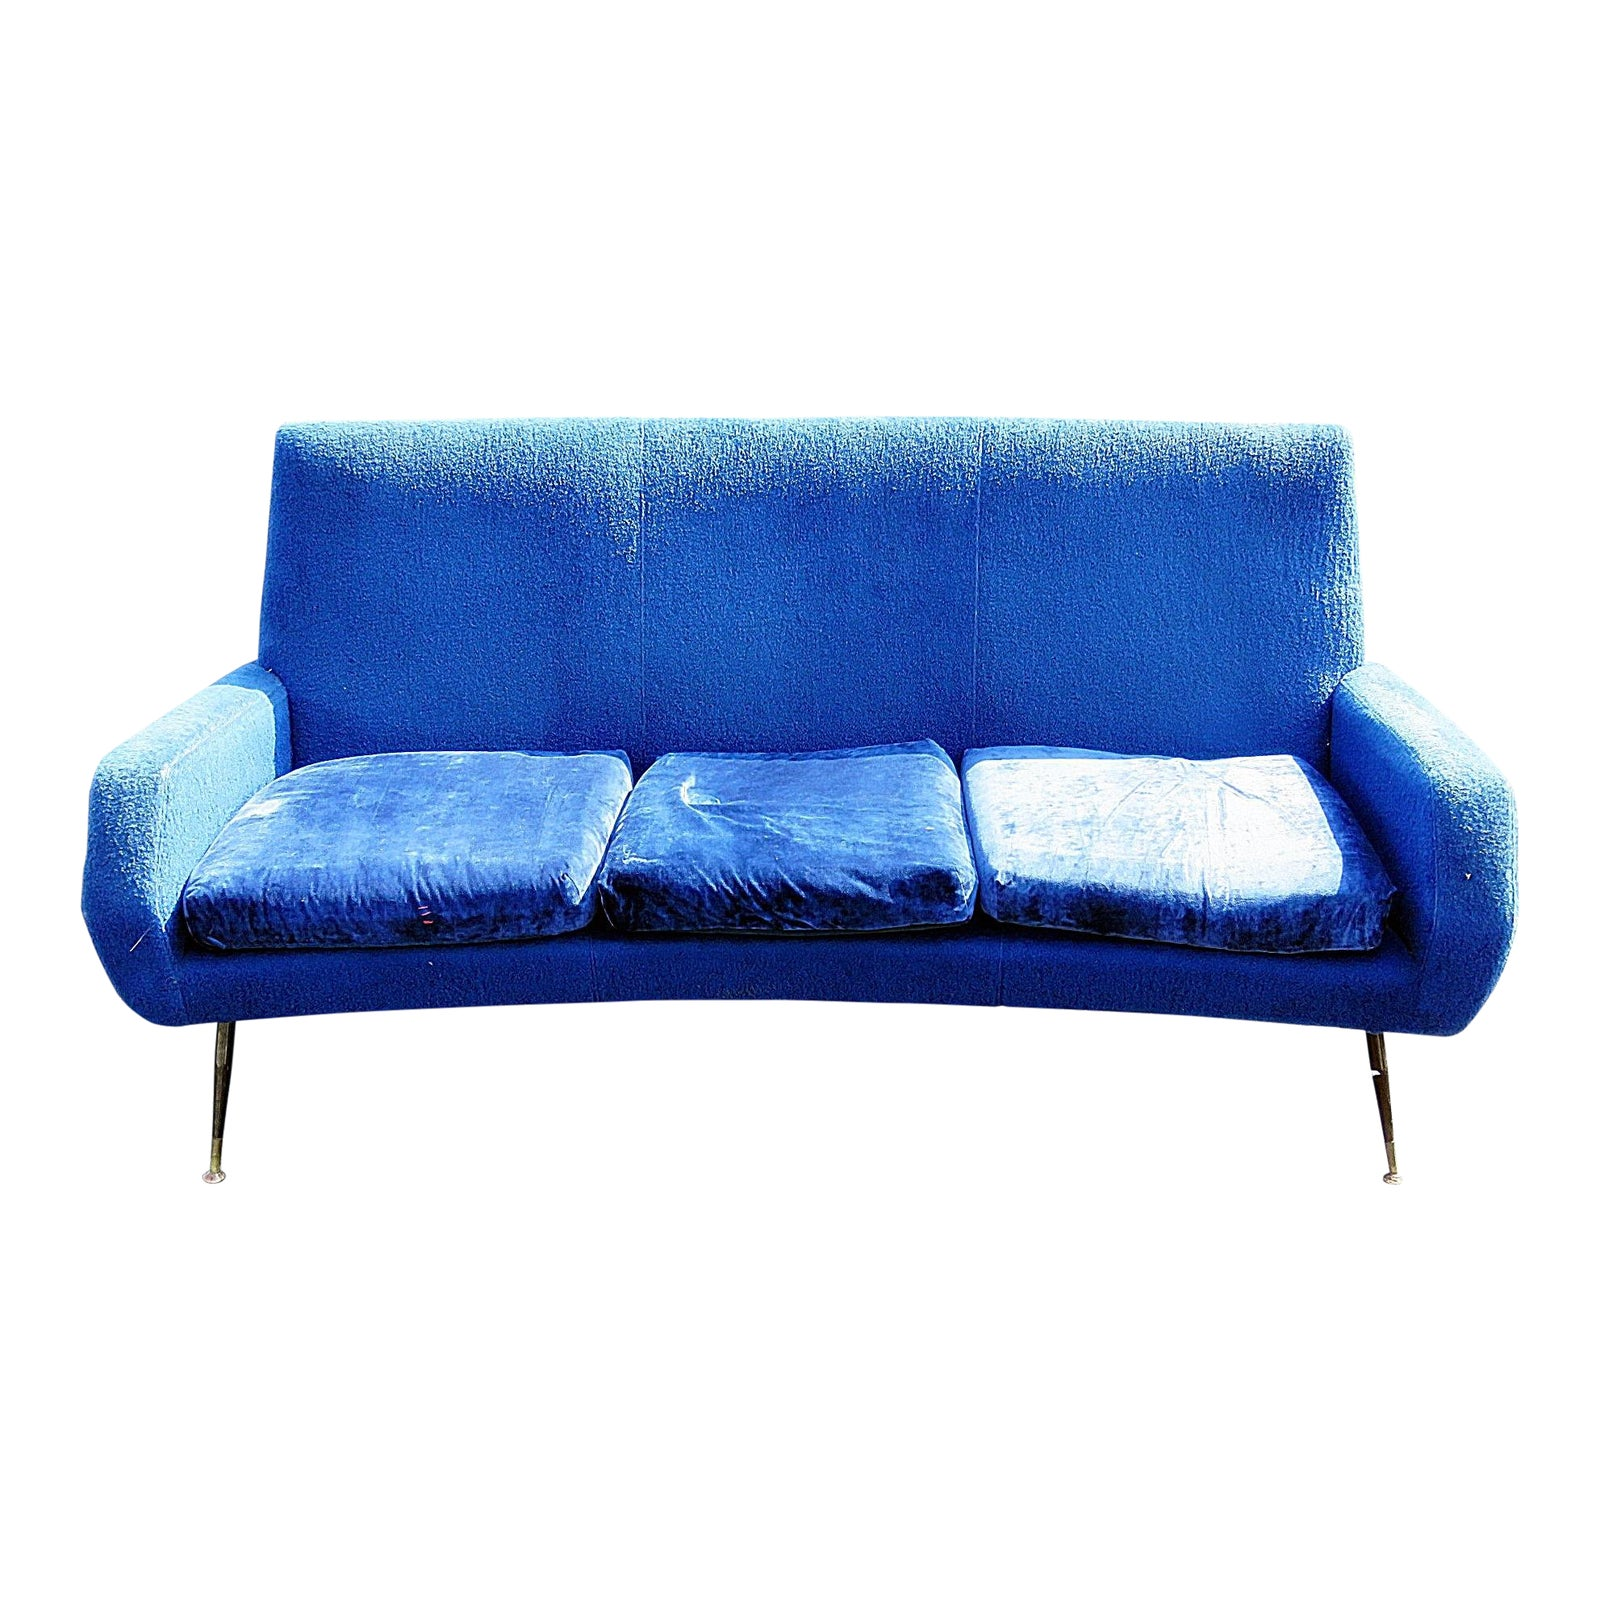 Vintage Italian Mid Century Modern Sofa